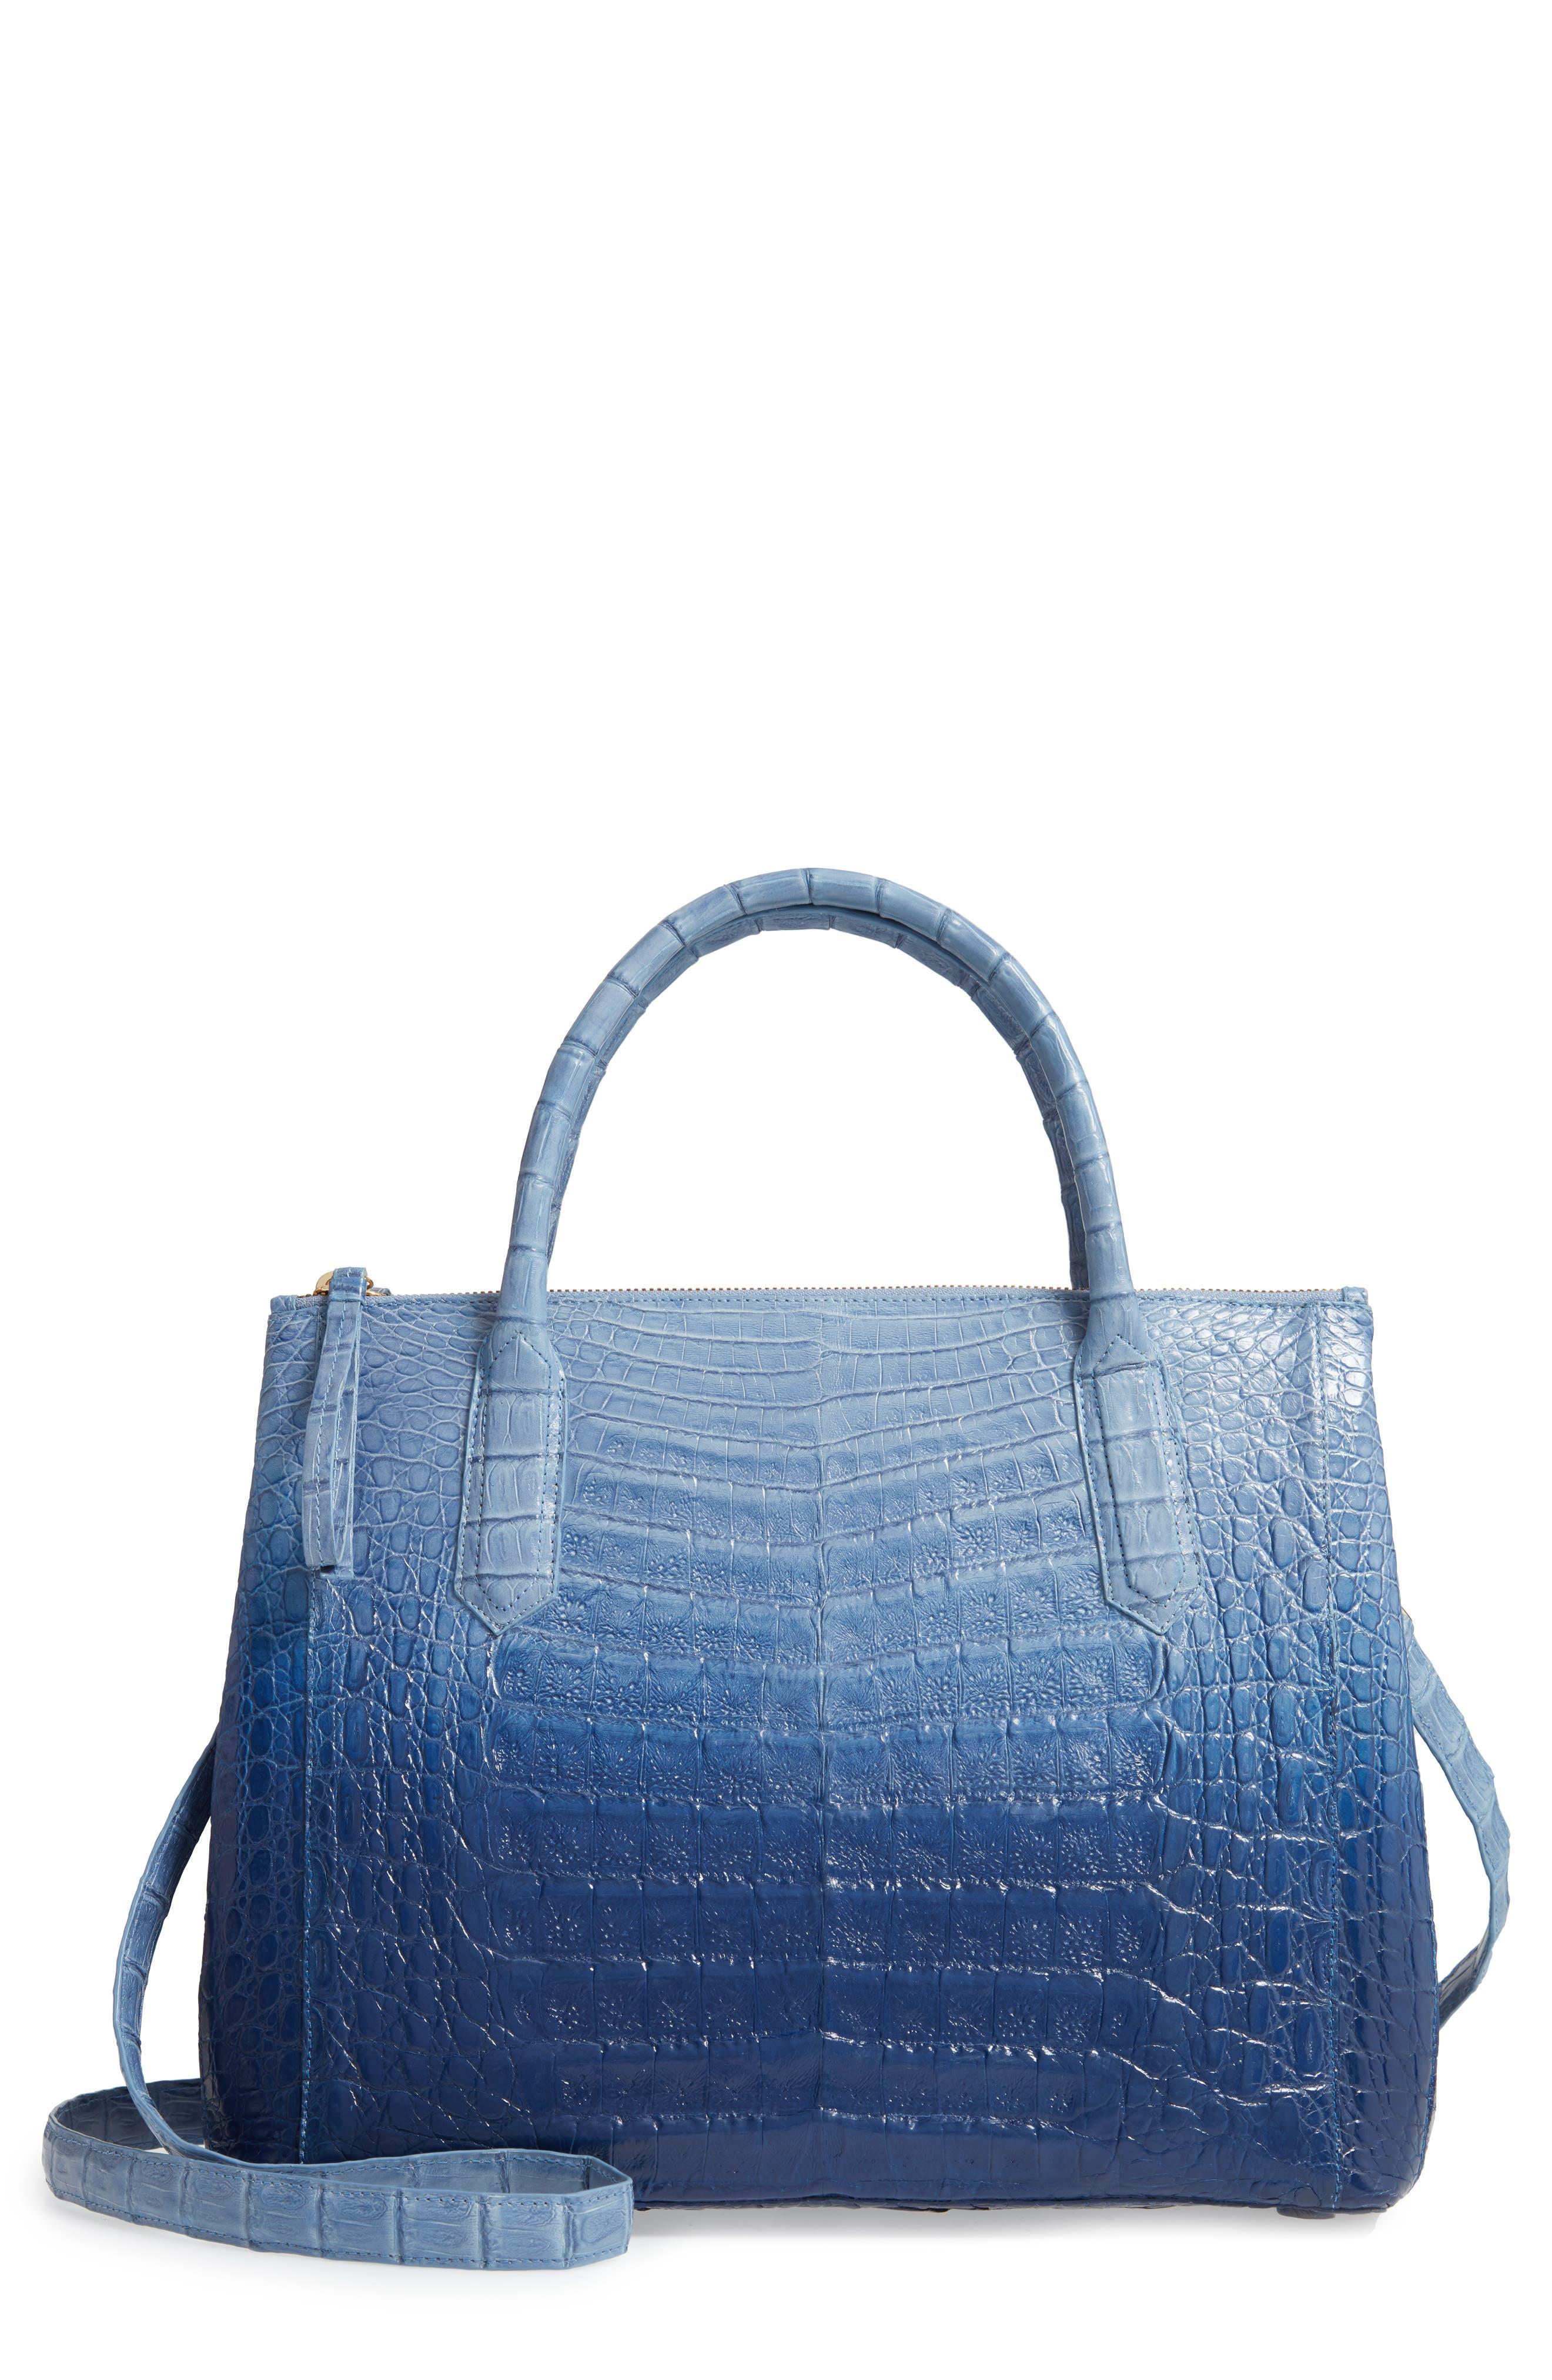 NANCY GONZALEZ, Medium Double Zip Genuine Crocodile Tote, Main thumbnail 1, color, BLUE DEGRADE